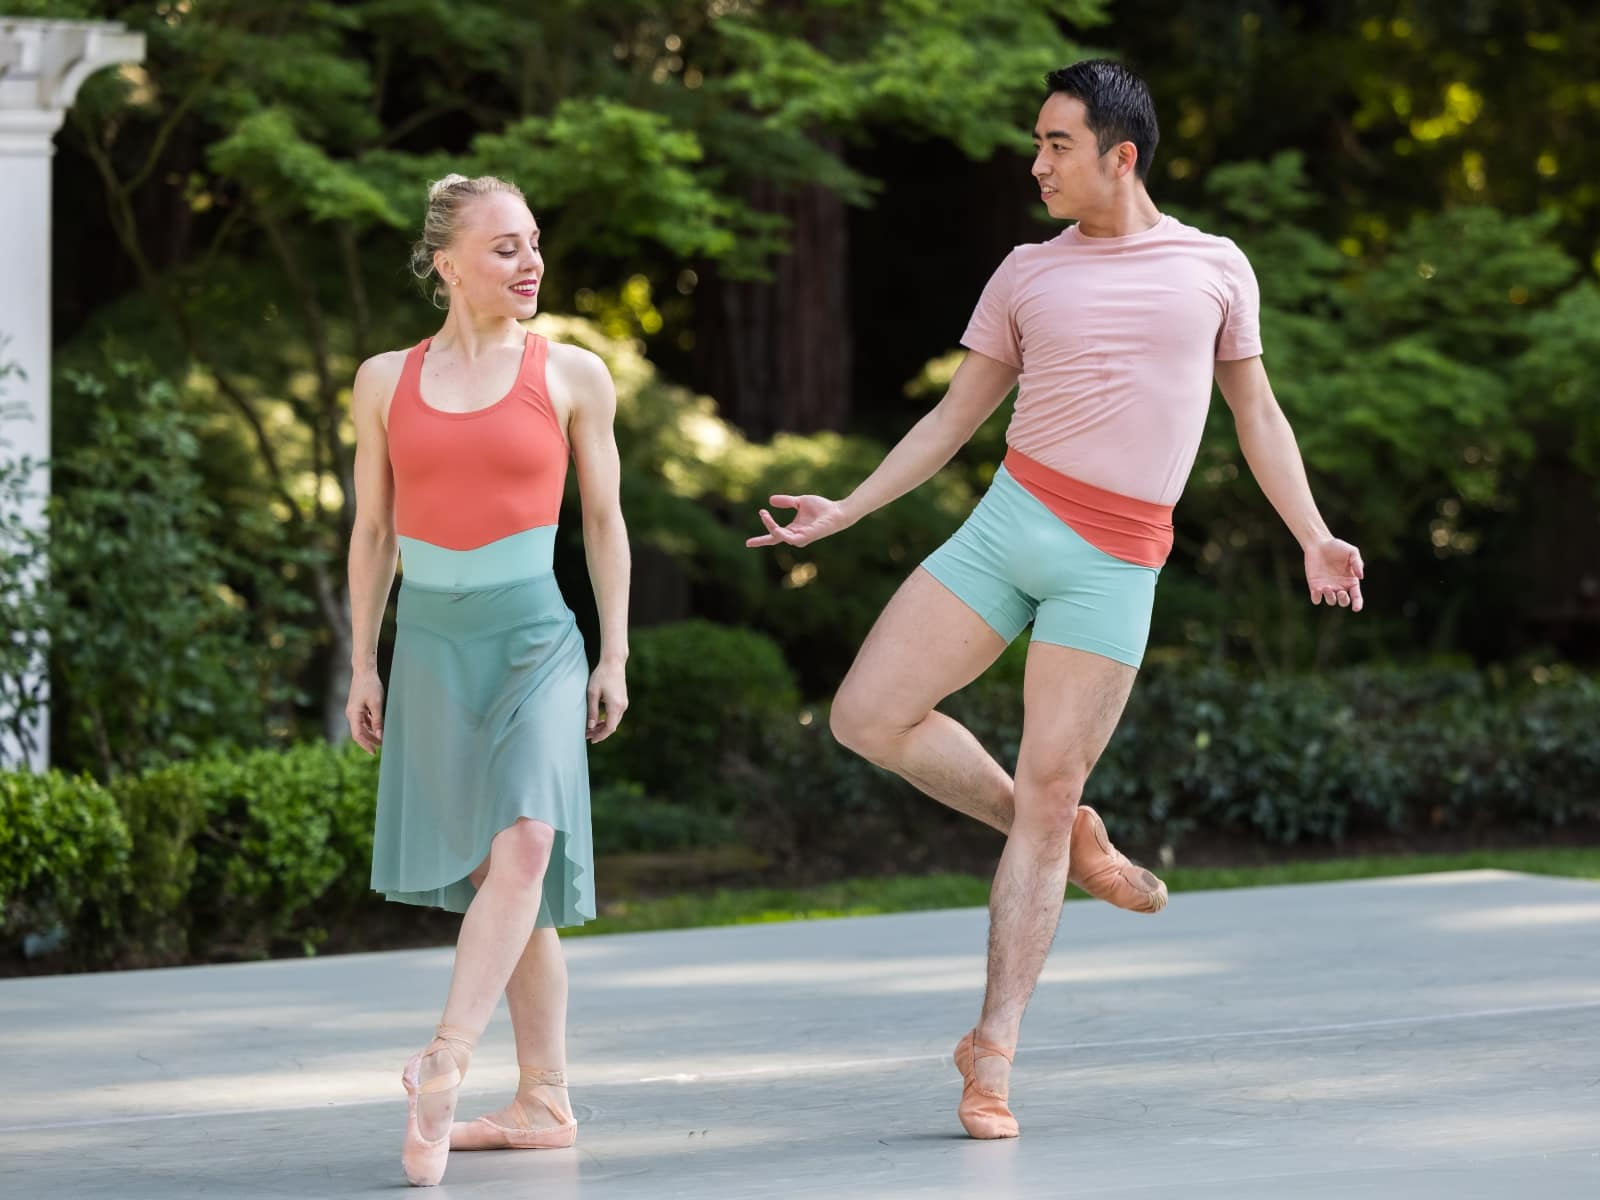 Meng and Lauren dancing together.